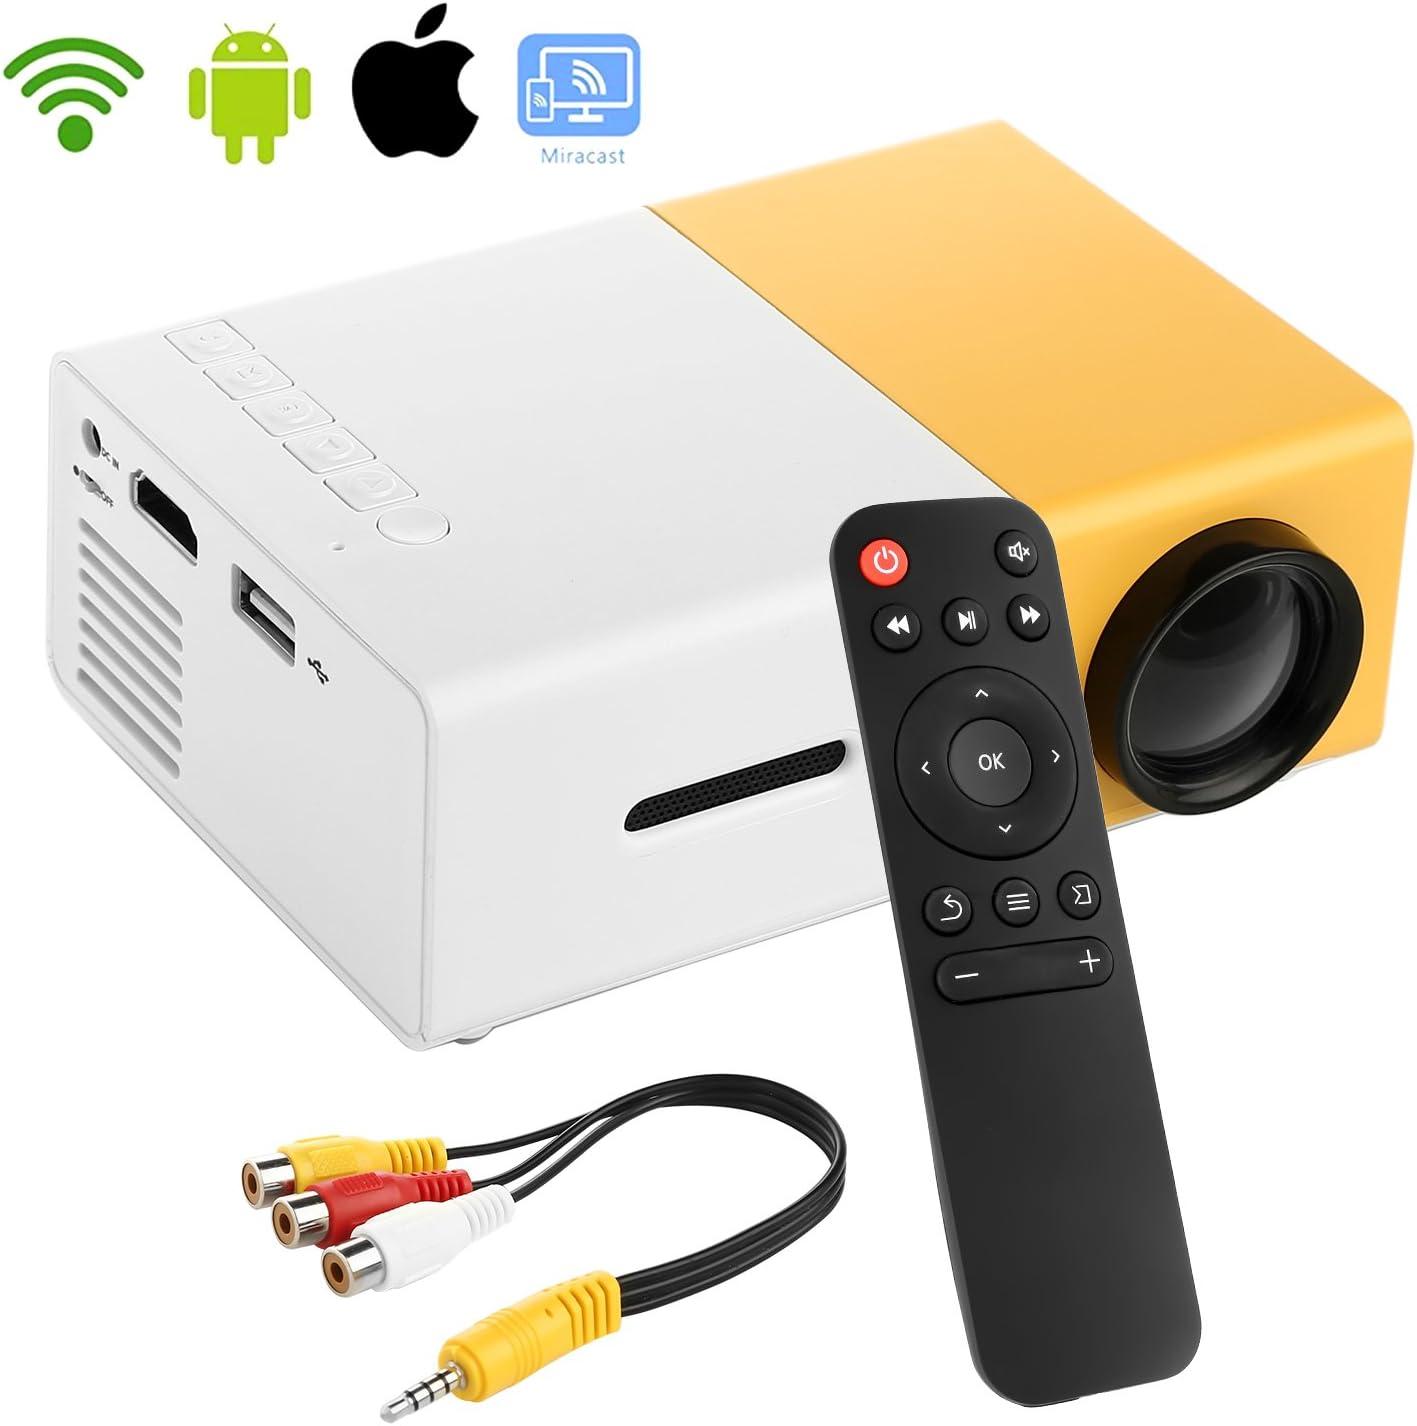 STOGA Mini Projector: Amazon.es: Electrónica